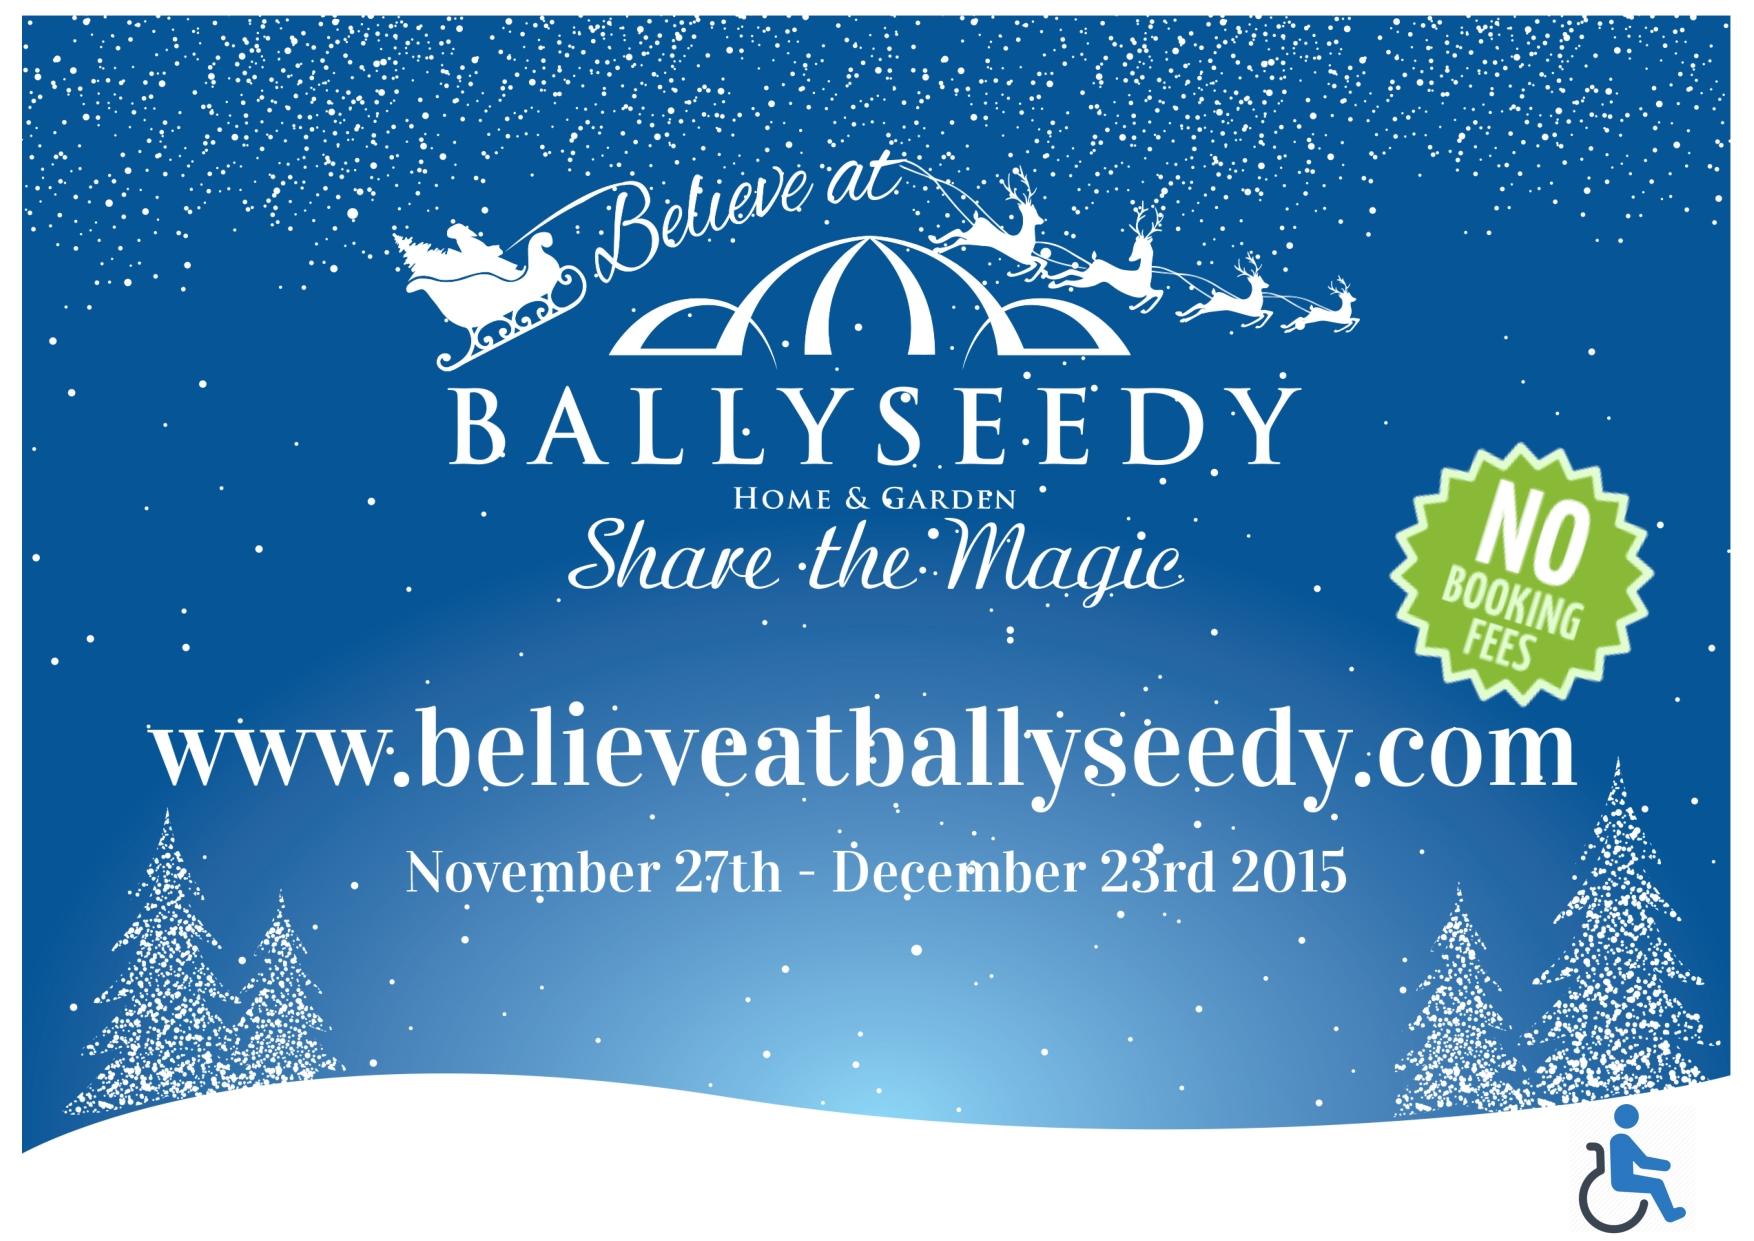 Believe at Ballyseedy